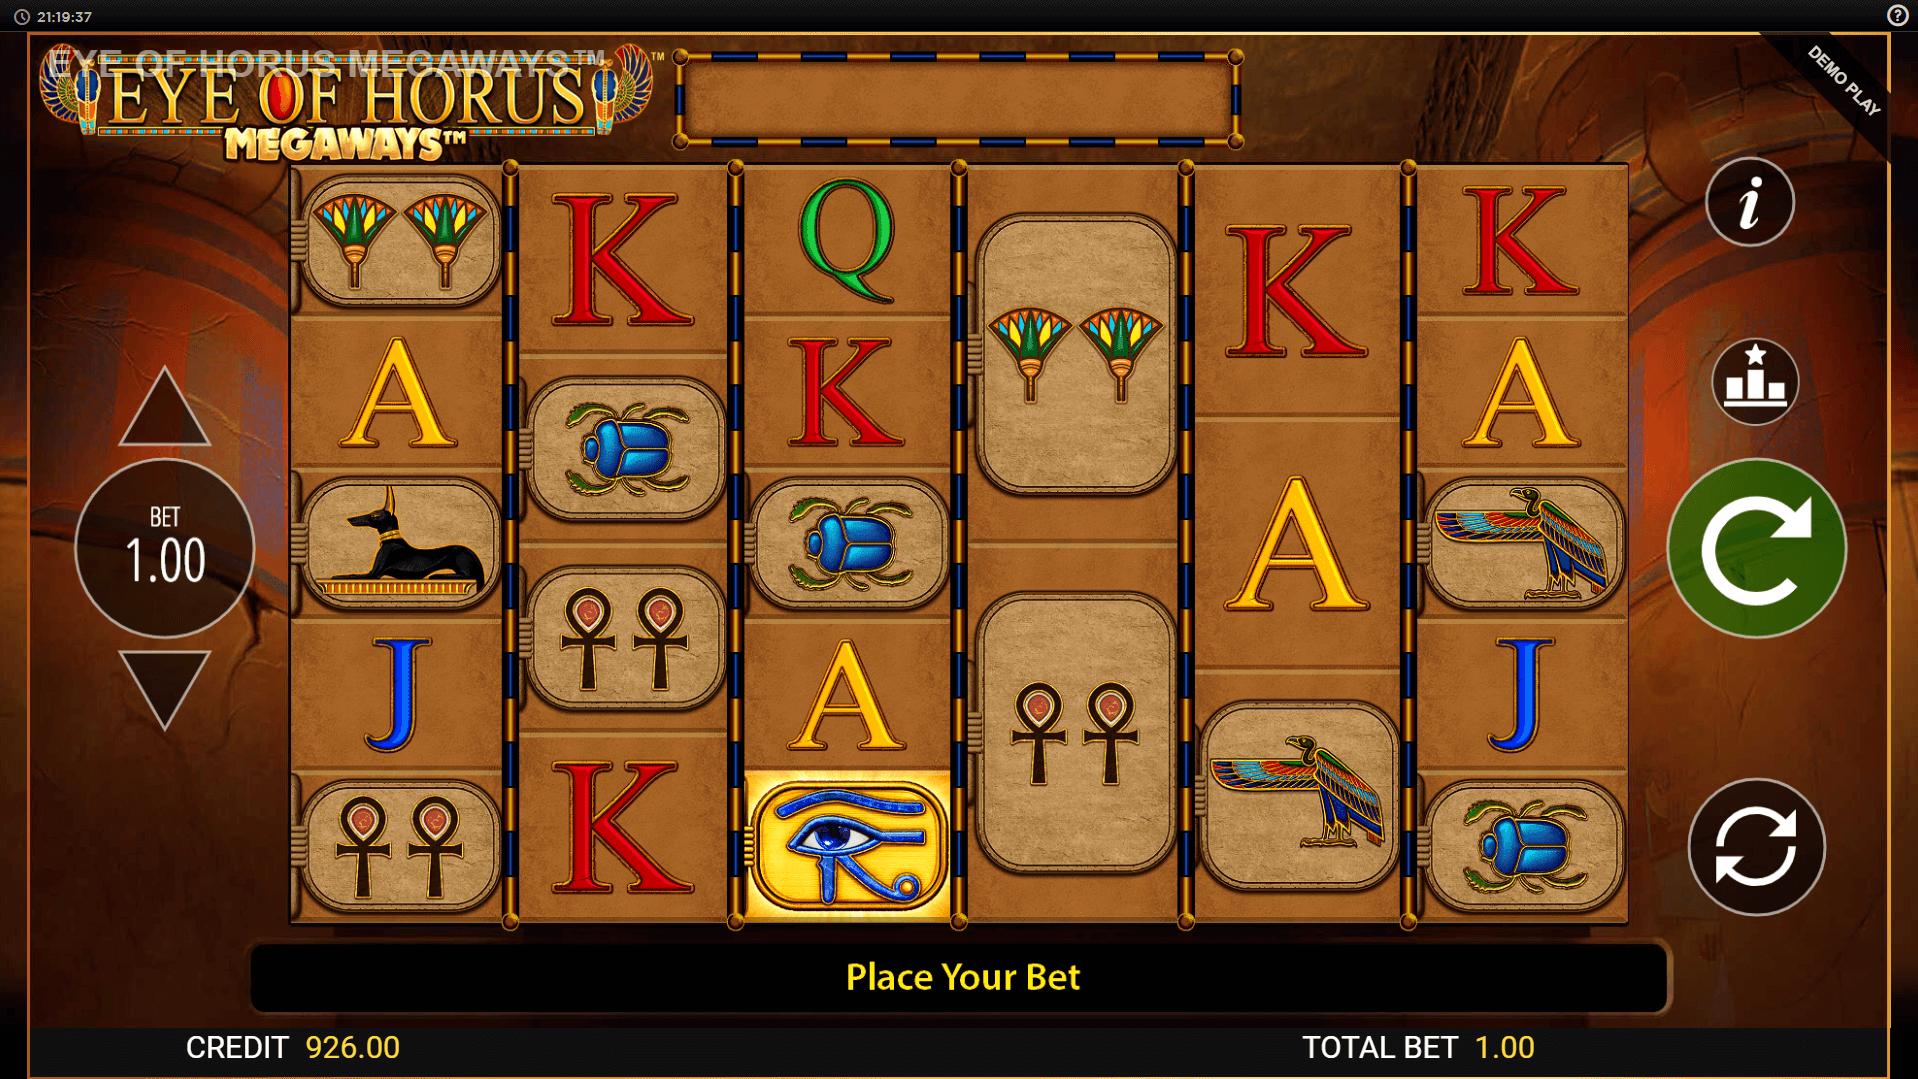 Eye of Horus Megaways slot machine screenshot